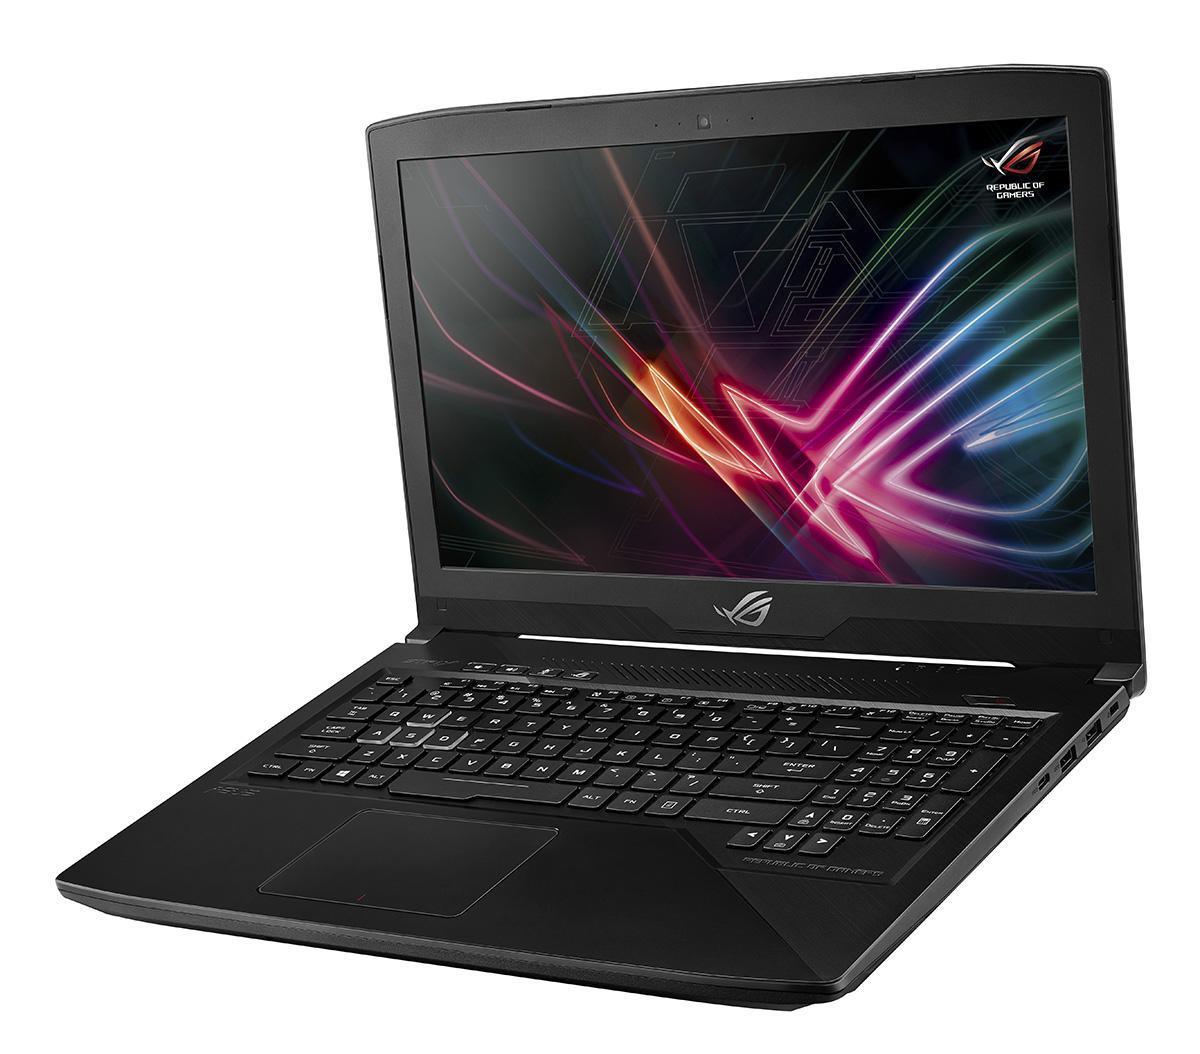 Asus 90NR0GN1-M05200 - PC portable Asus - Cybertek.fr - 3